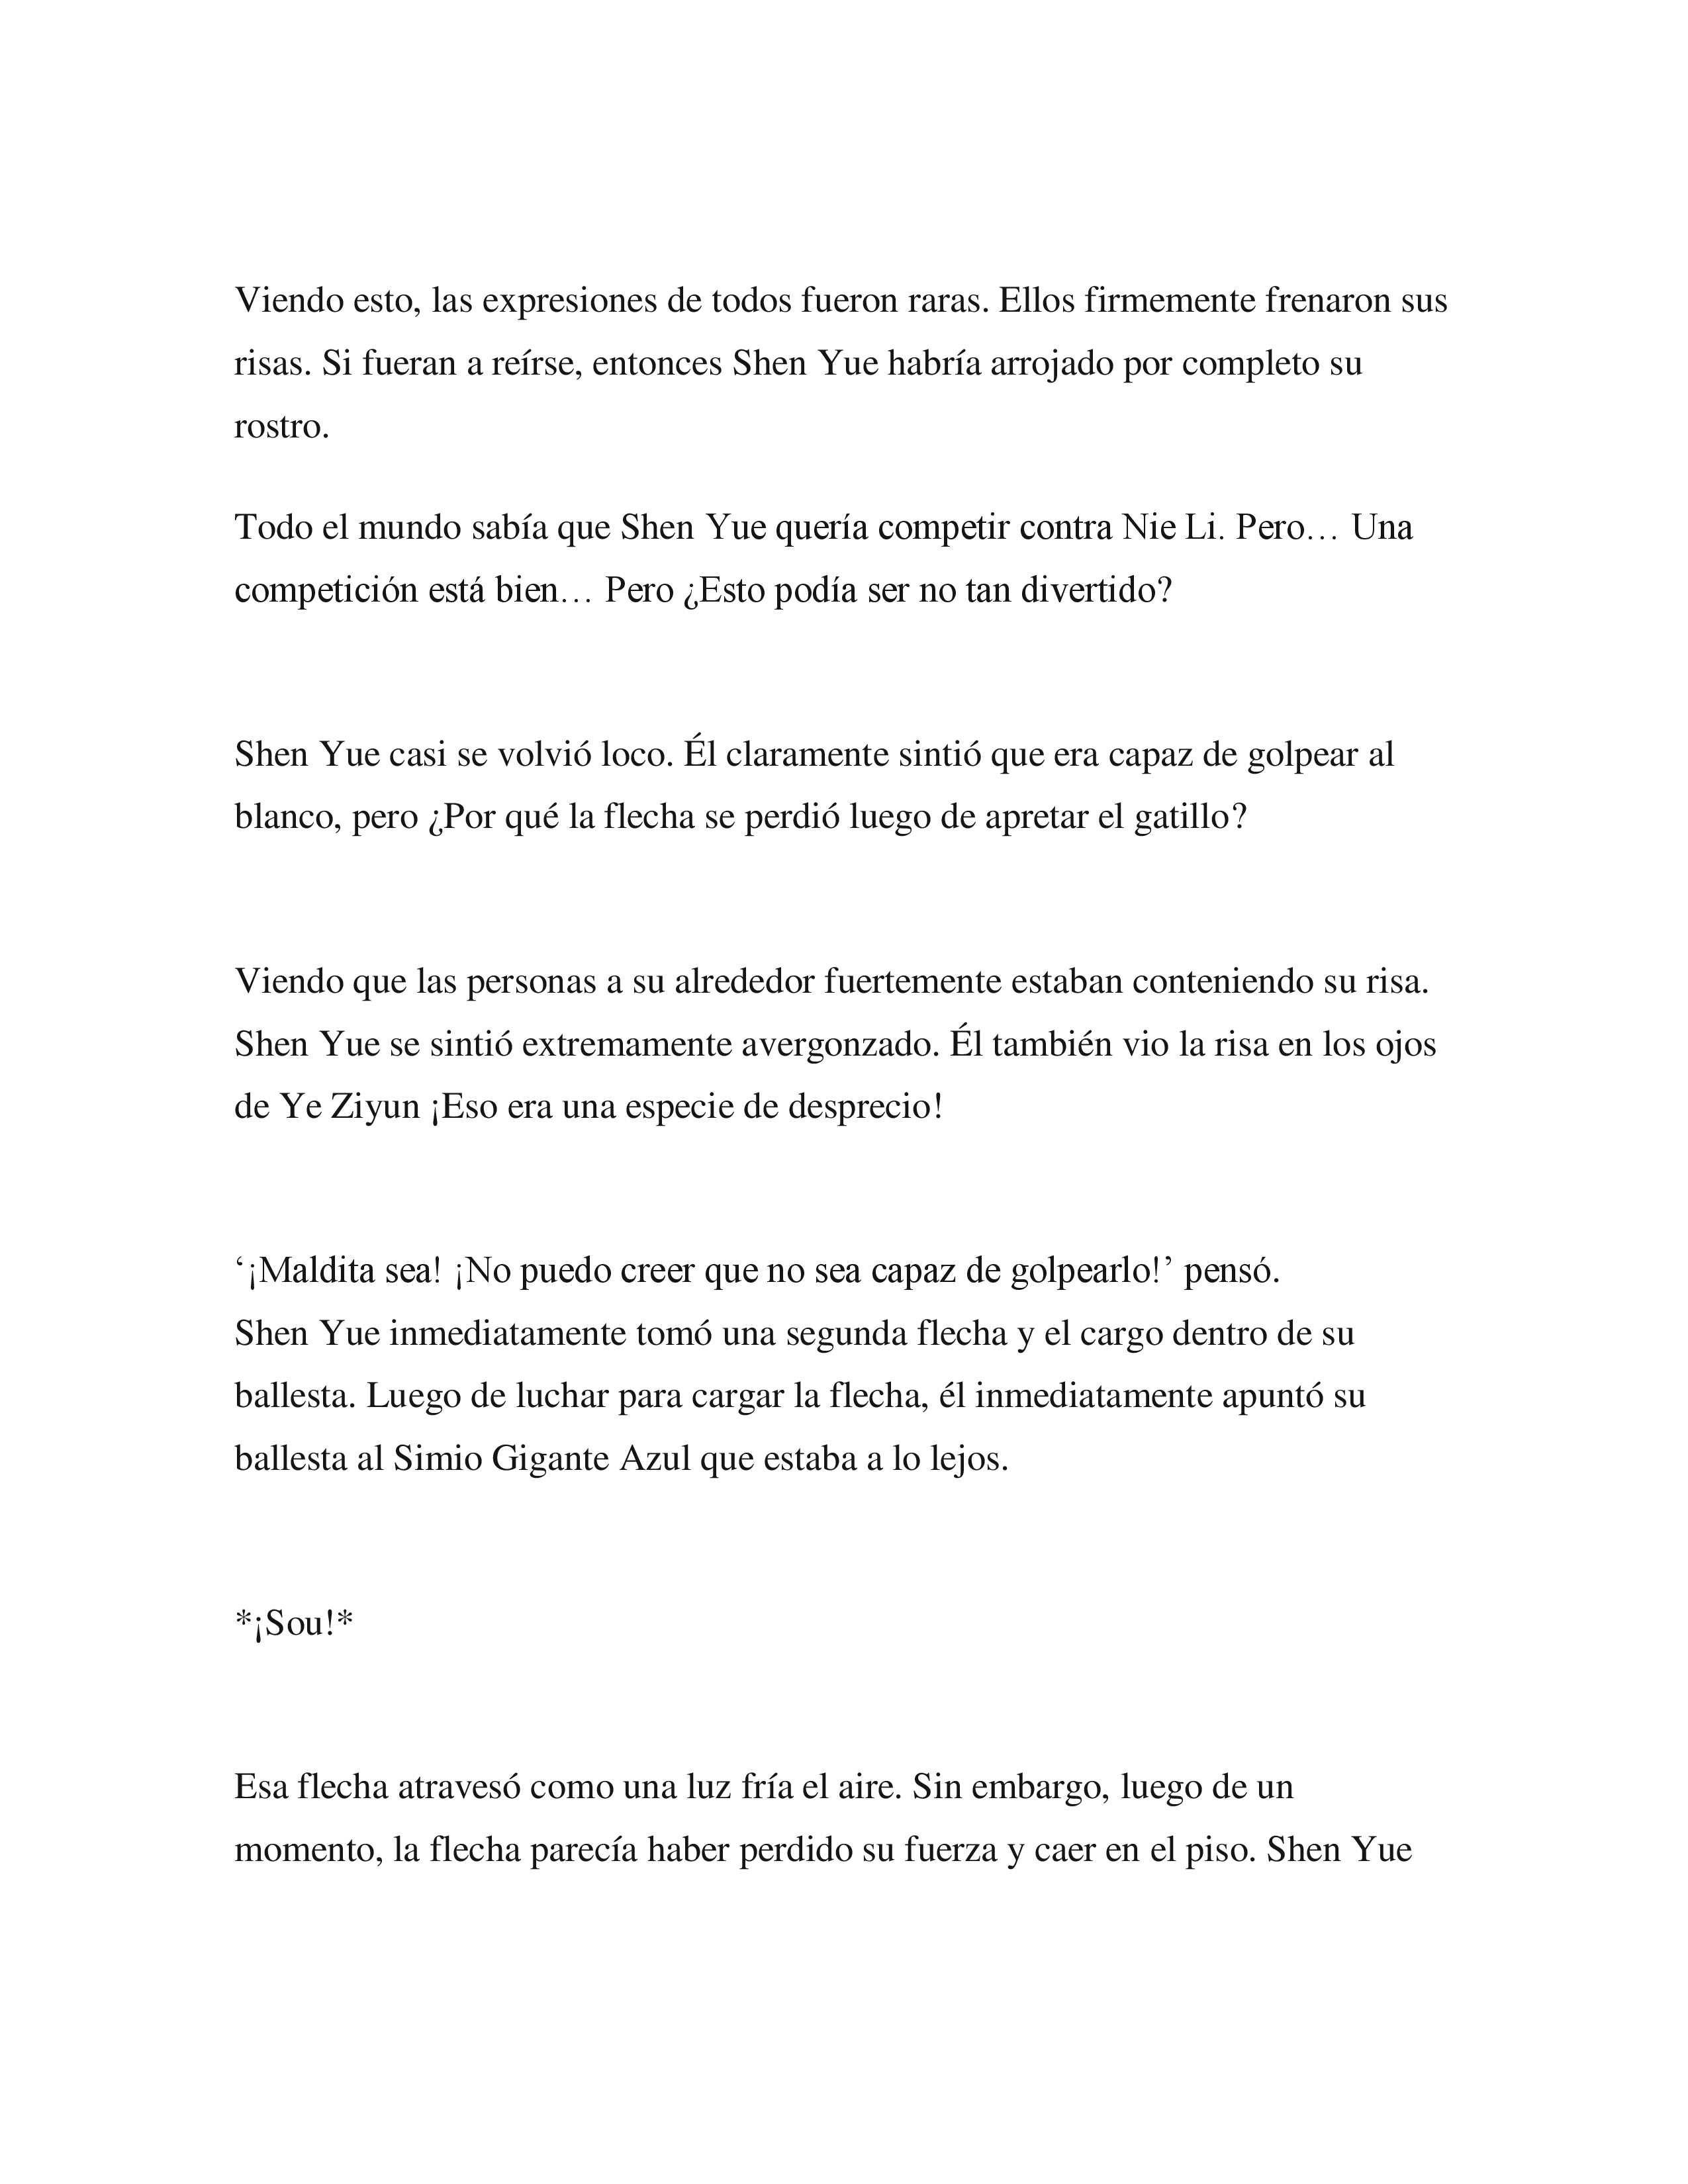 https://c5.ninemanga.com/es_manga/44/20012/484377/a9a80dd485d4058159acd75553f0d2f2.jpg Page 4